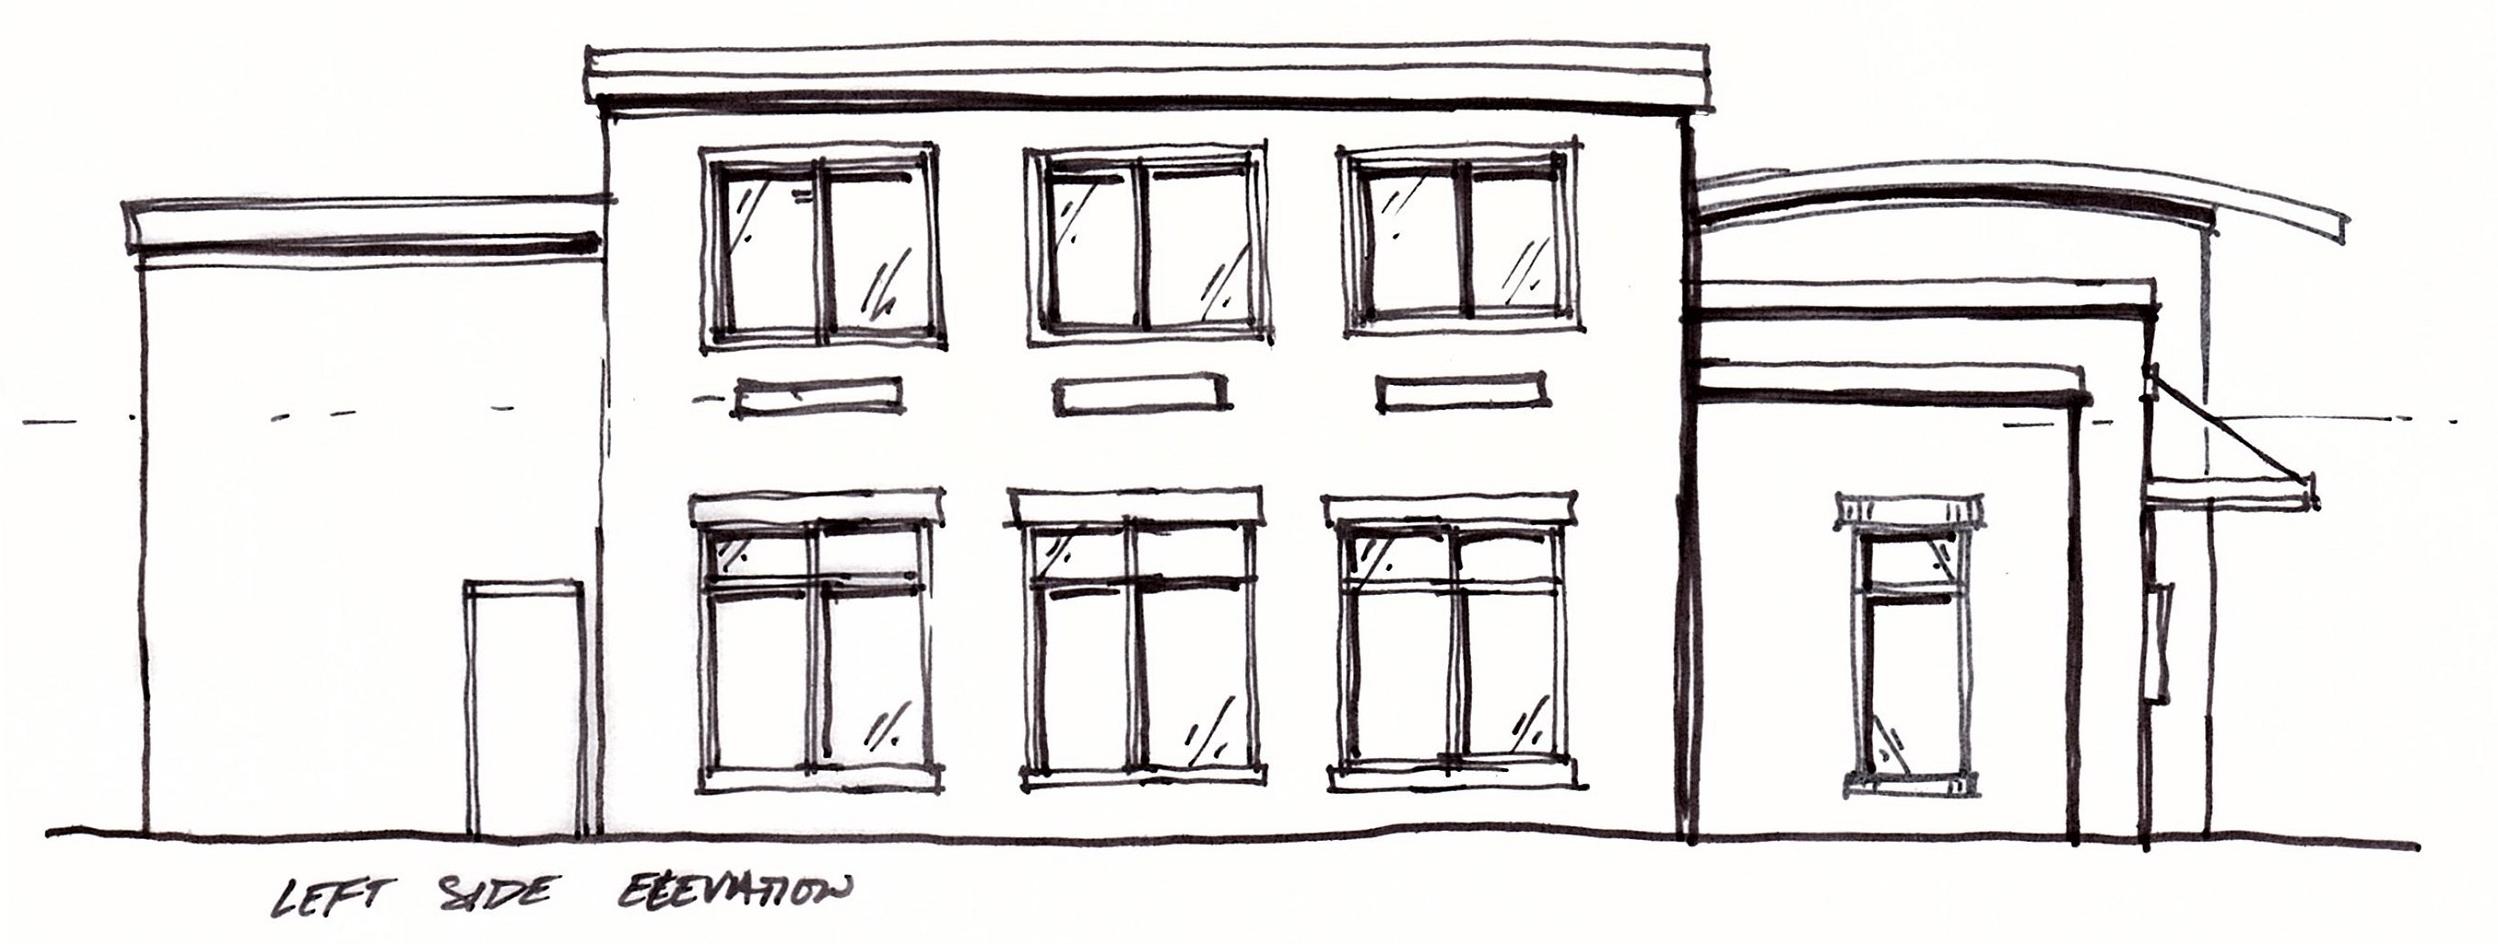 BlackbridgeFinancial_SketchElevation_Left_8_17_16.jpg